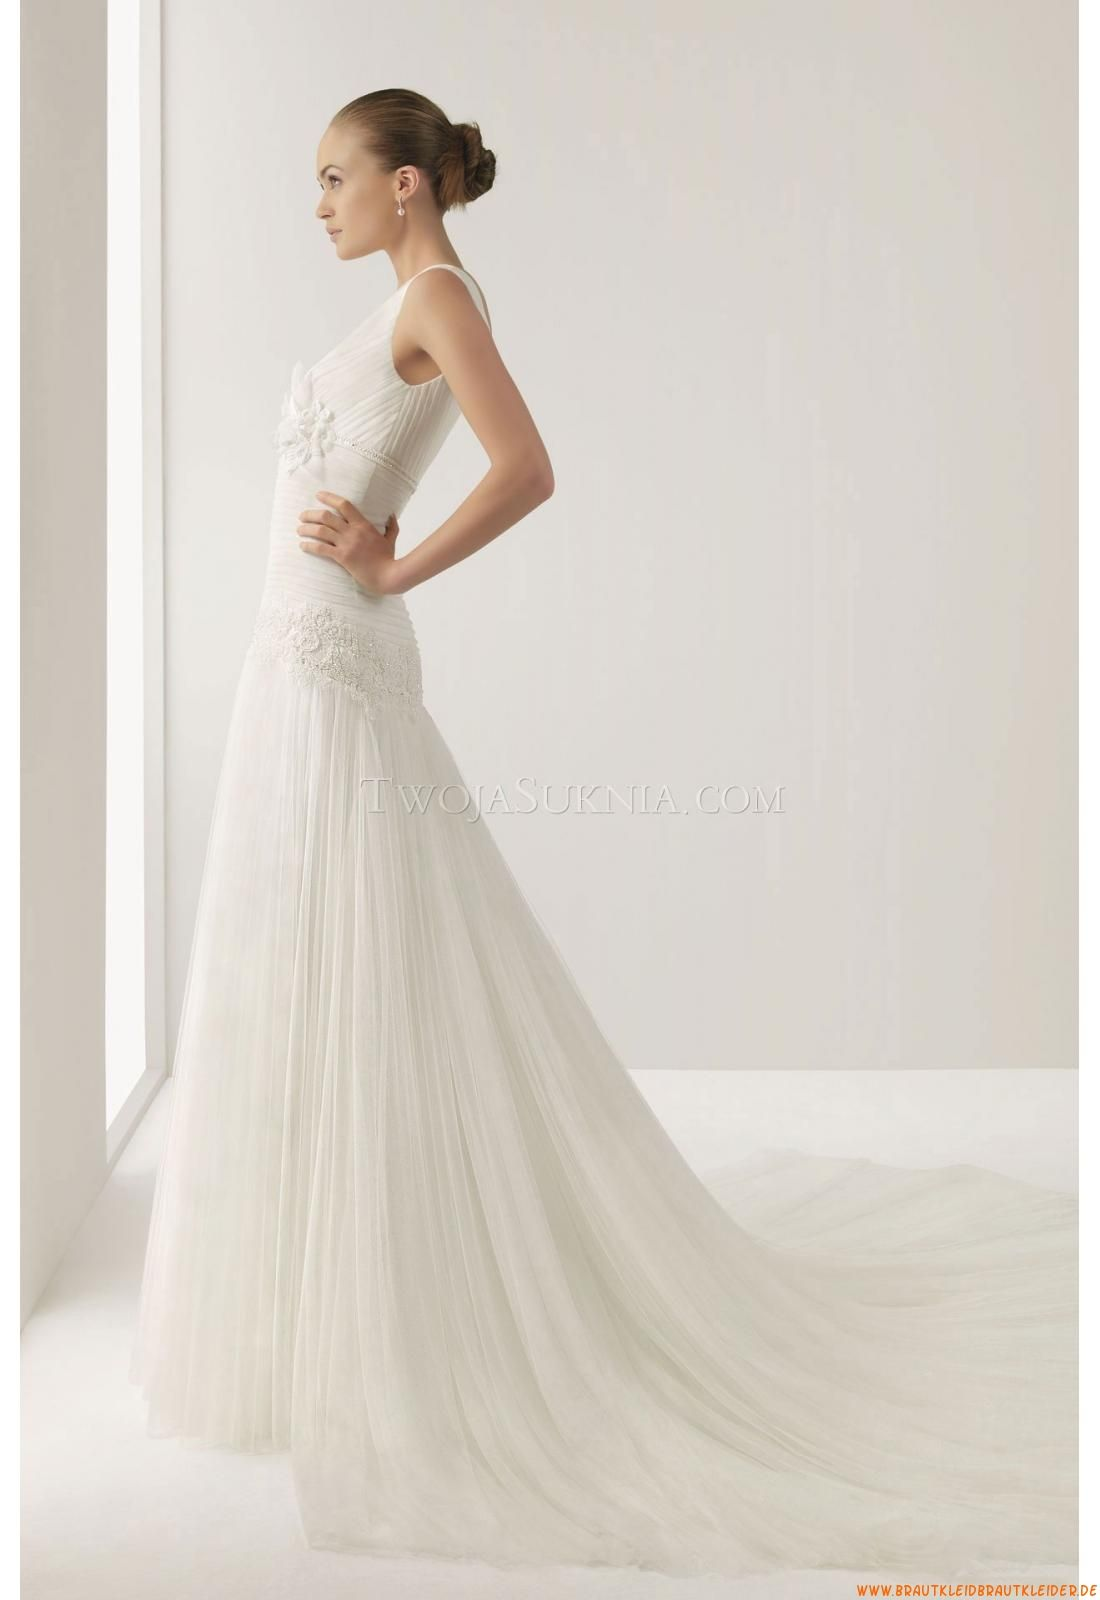 Dorable Rosa Clara Wedding Dresses Prices Sketch - Wedding Dress ...